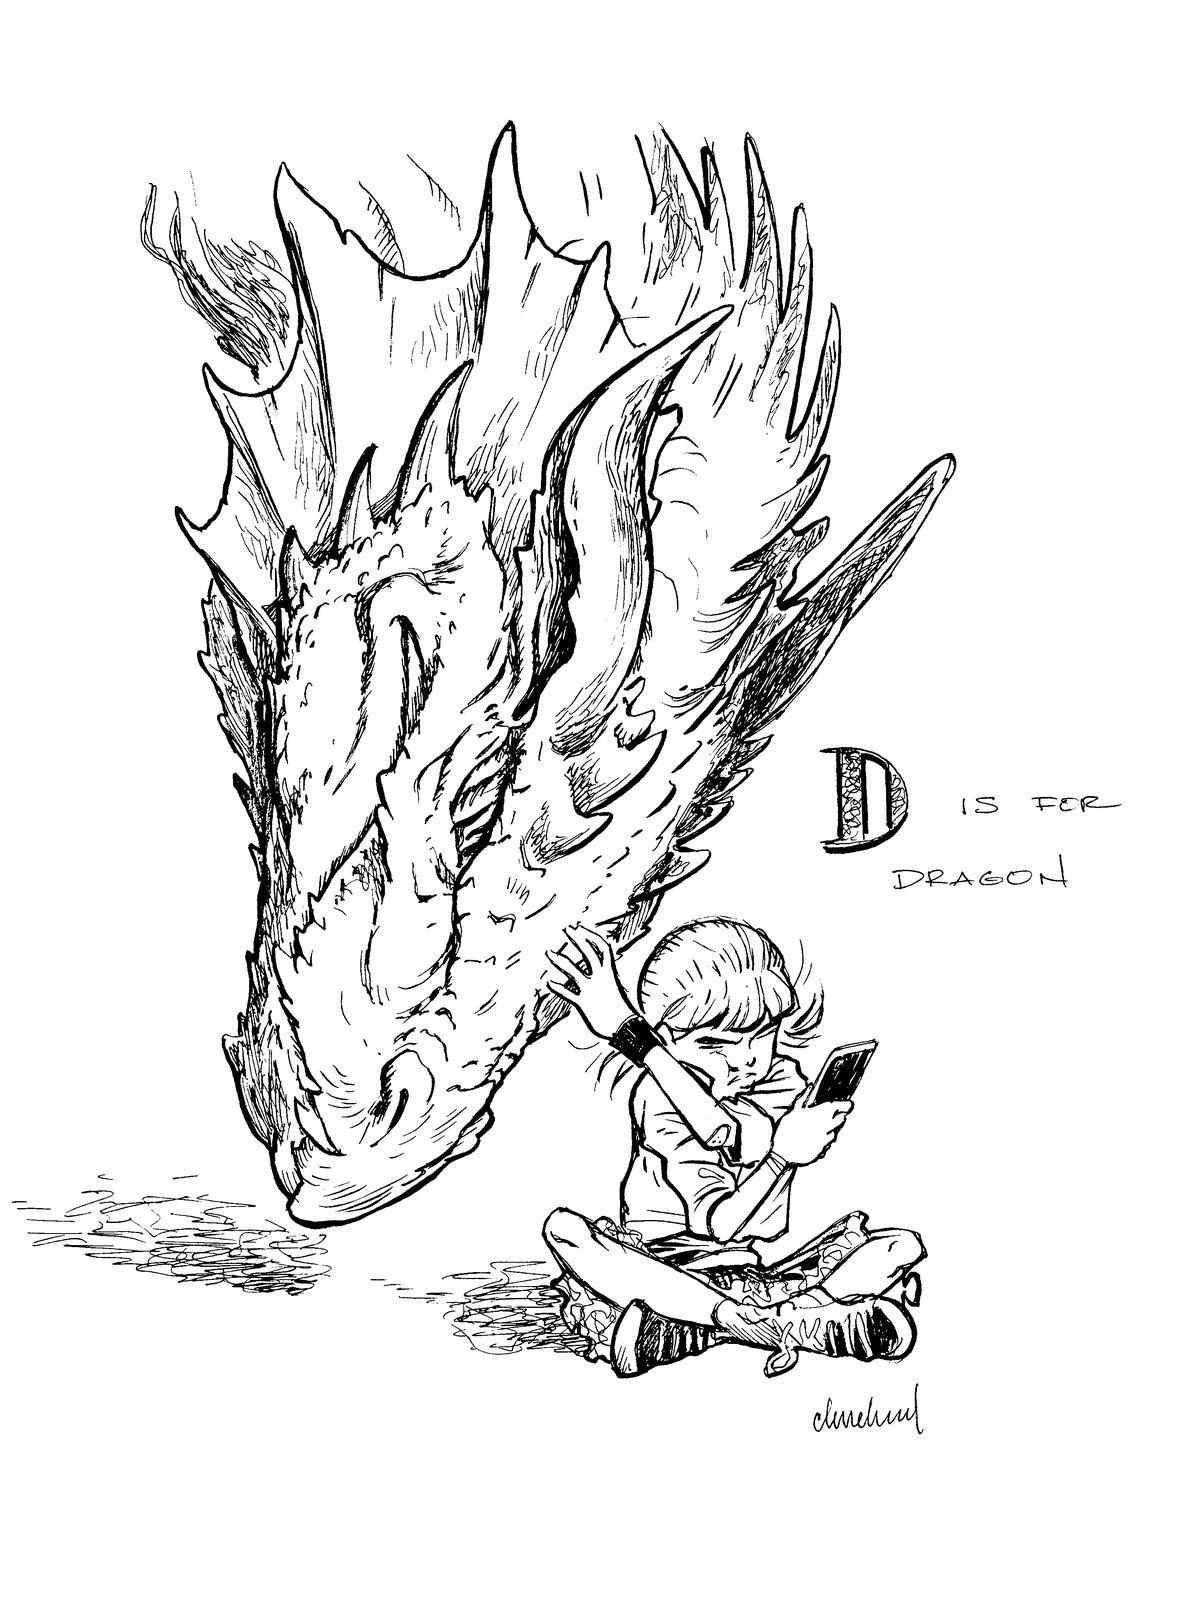 D&D children's books teach ABCs and 123s through